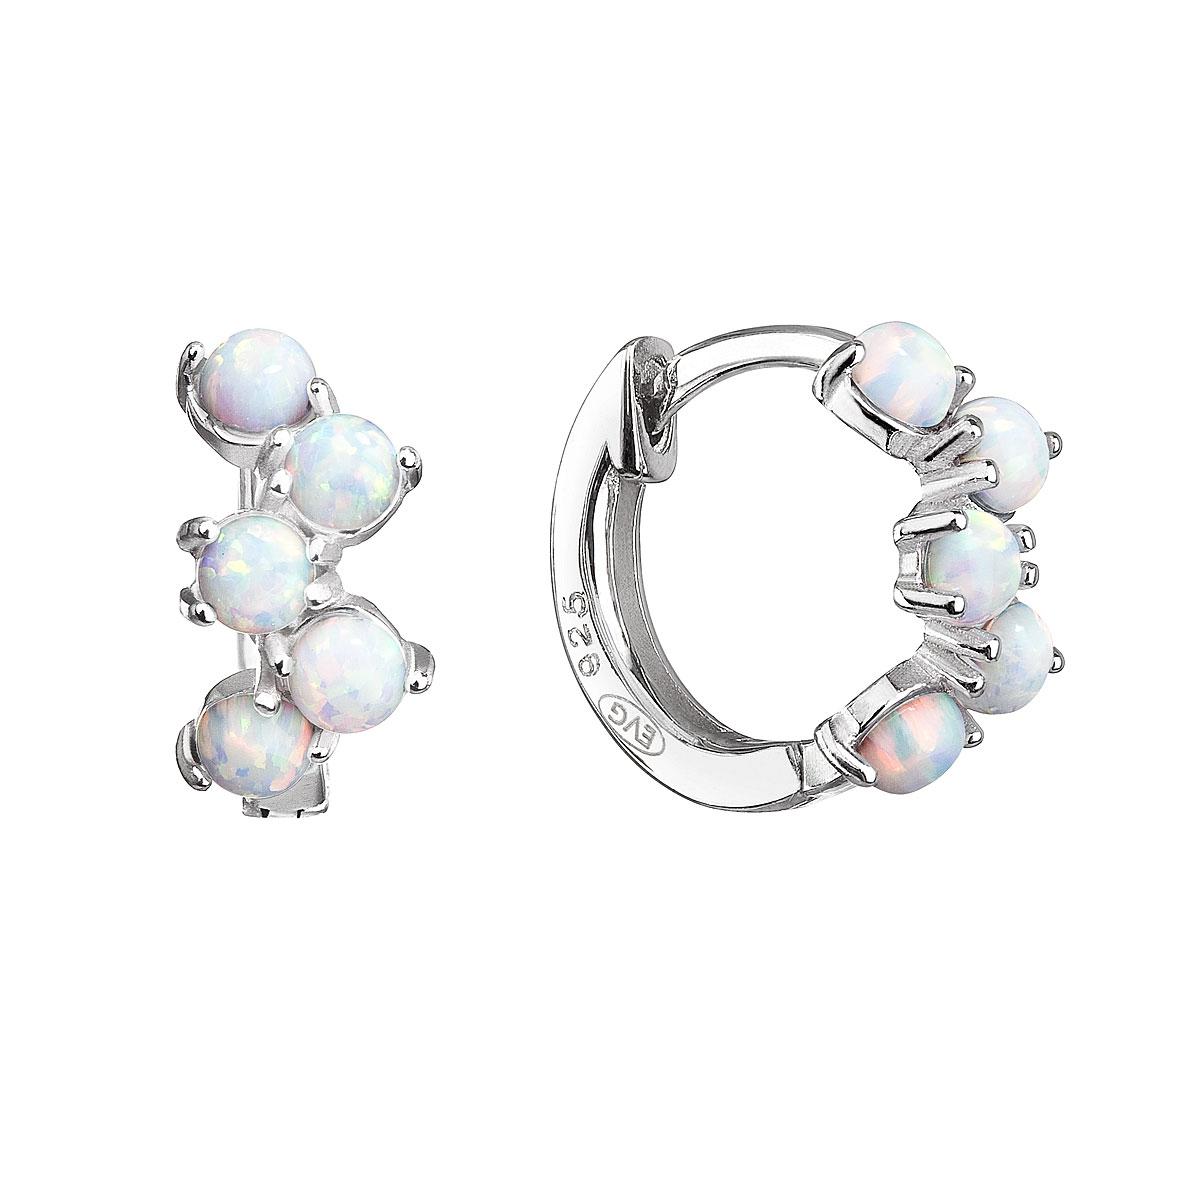 Strieborné náušnice kruhy so syntetickými opálmi biele 11339.1